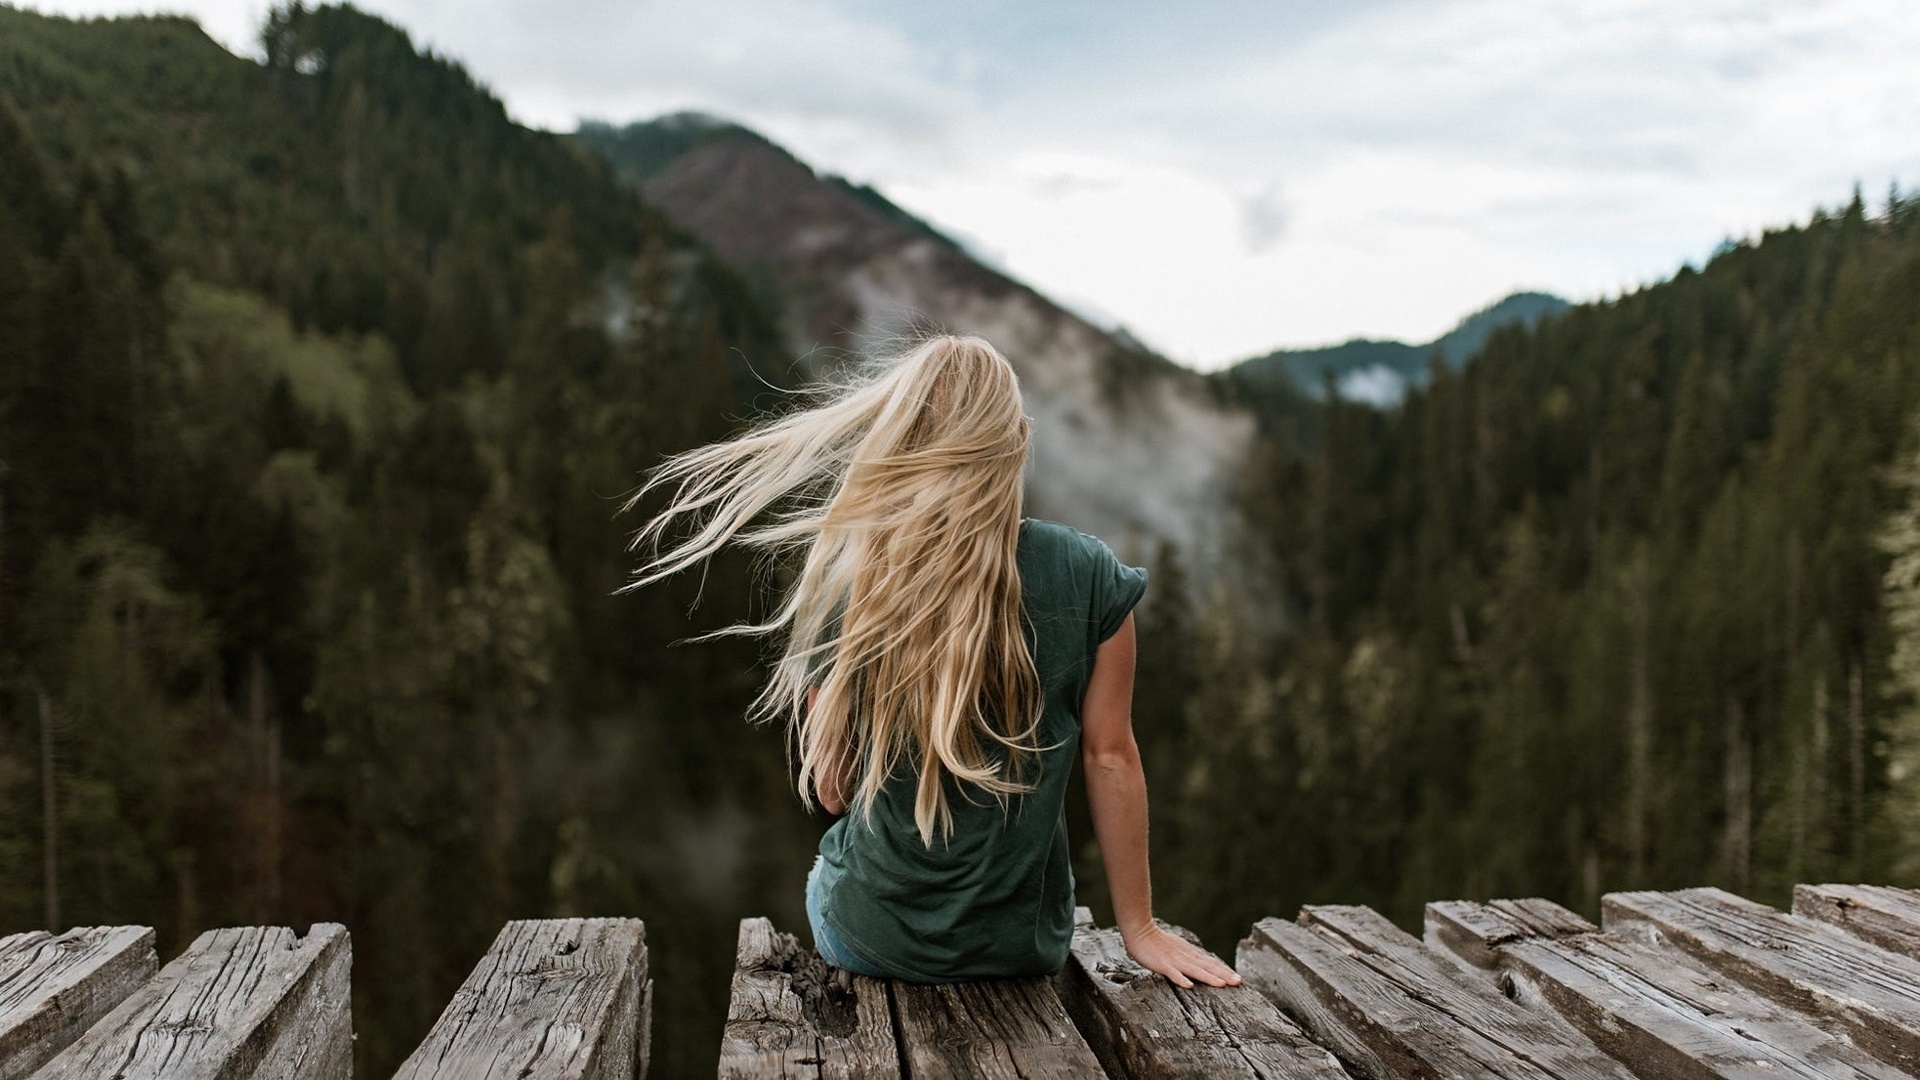 Картинки фото блондинки со спины, названиям али